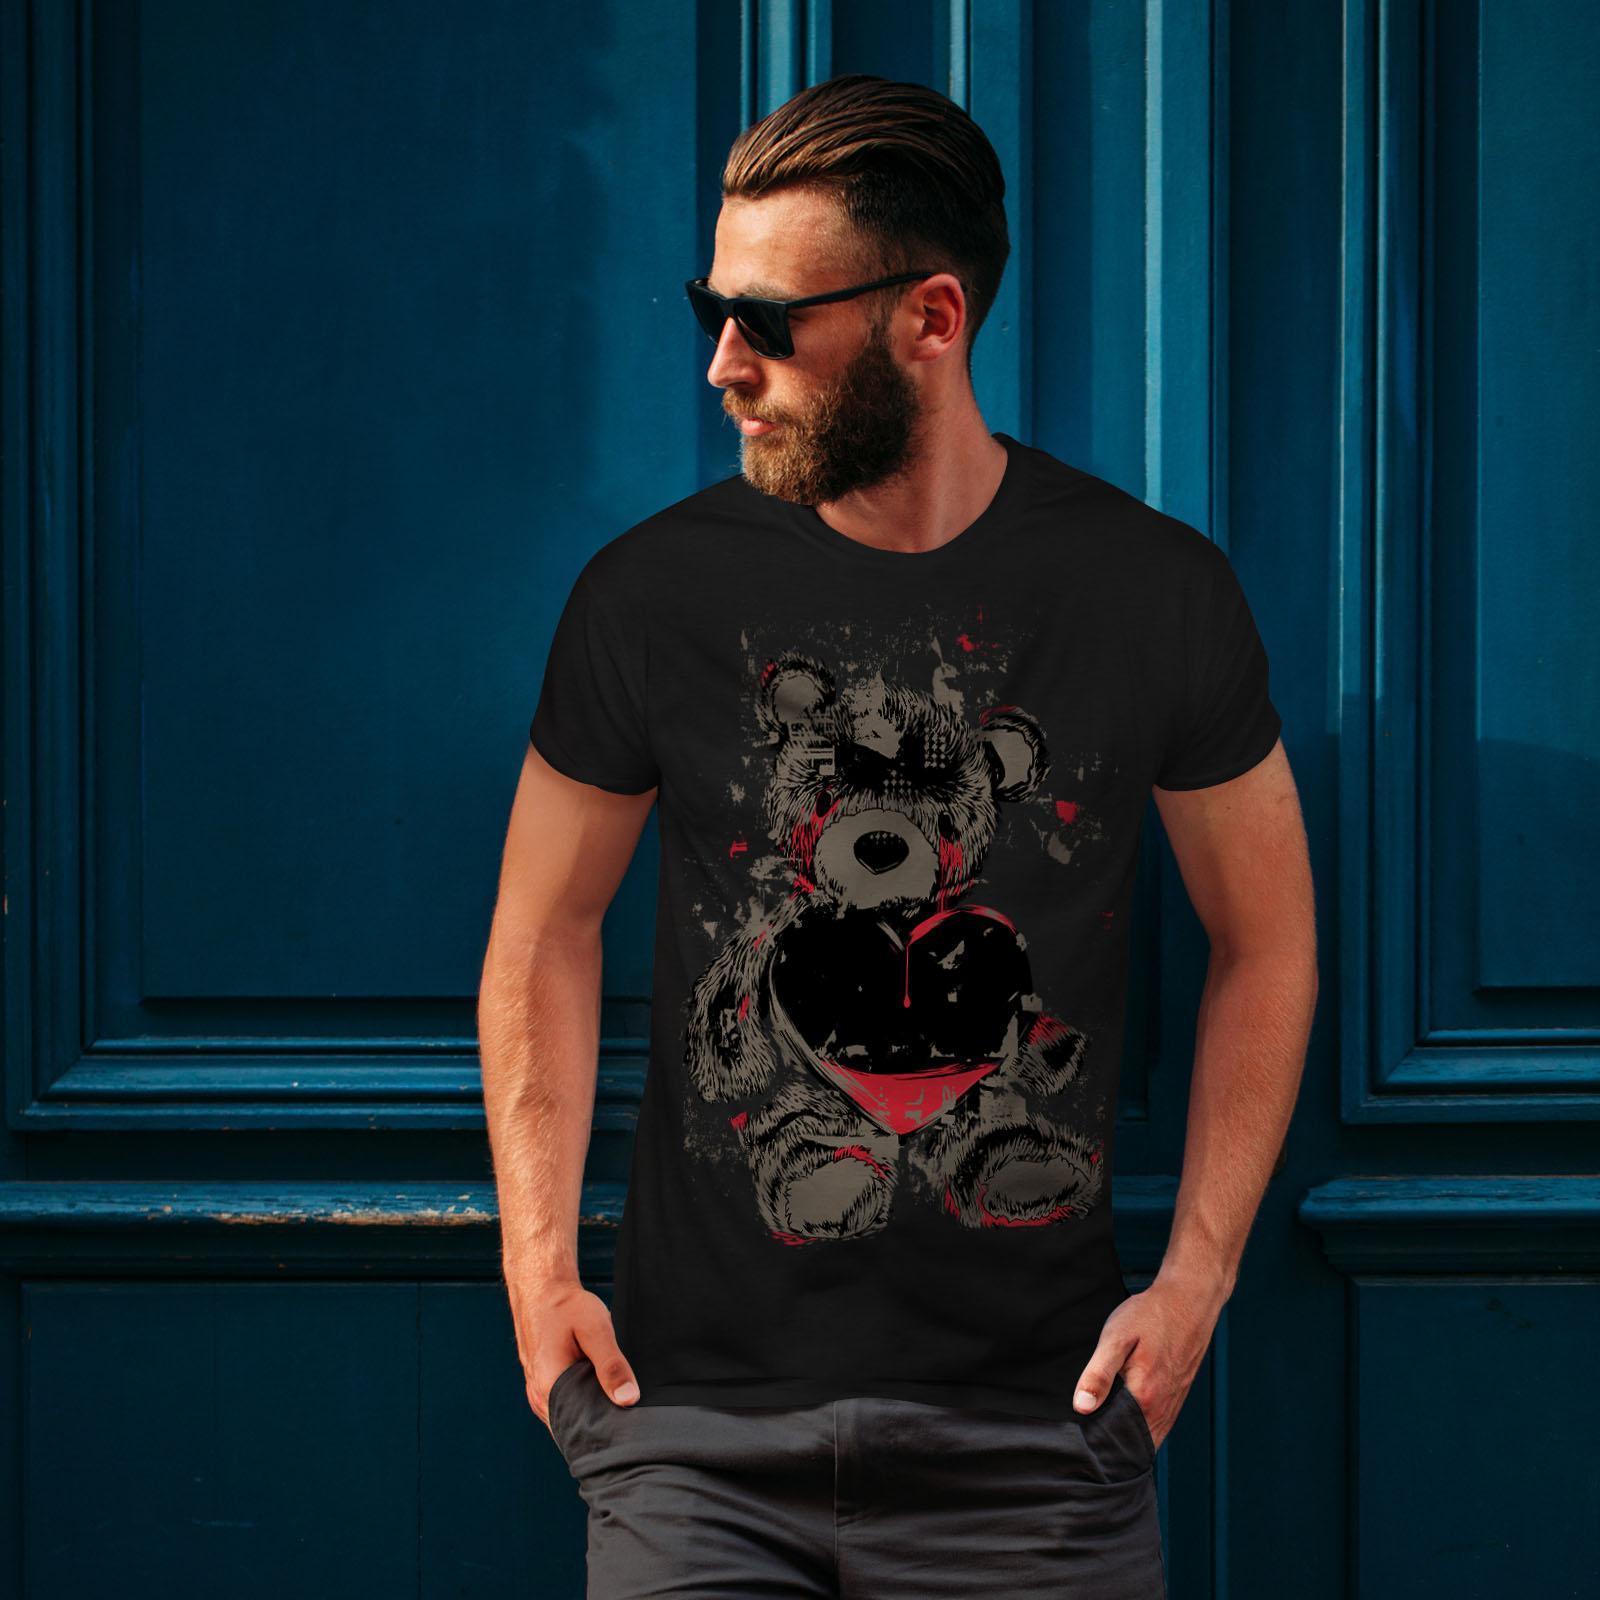 miniature 4 - Wellcoda Teddy Bear Love Hurt Mens T-shirt, Blood Graphic Design Printed Tee